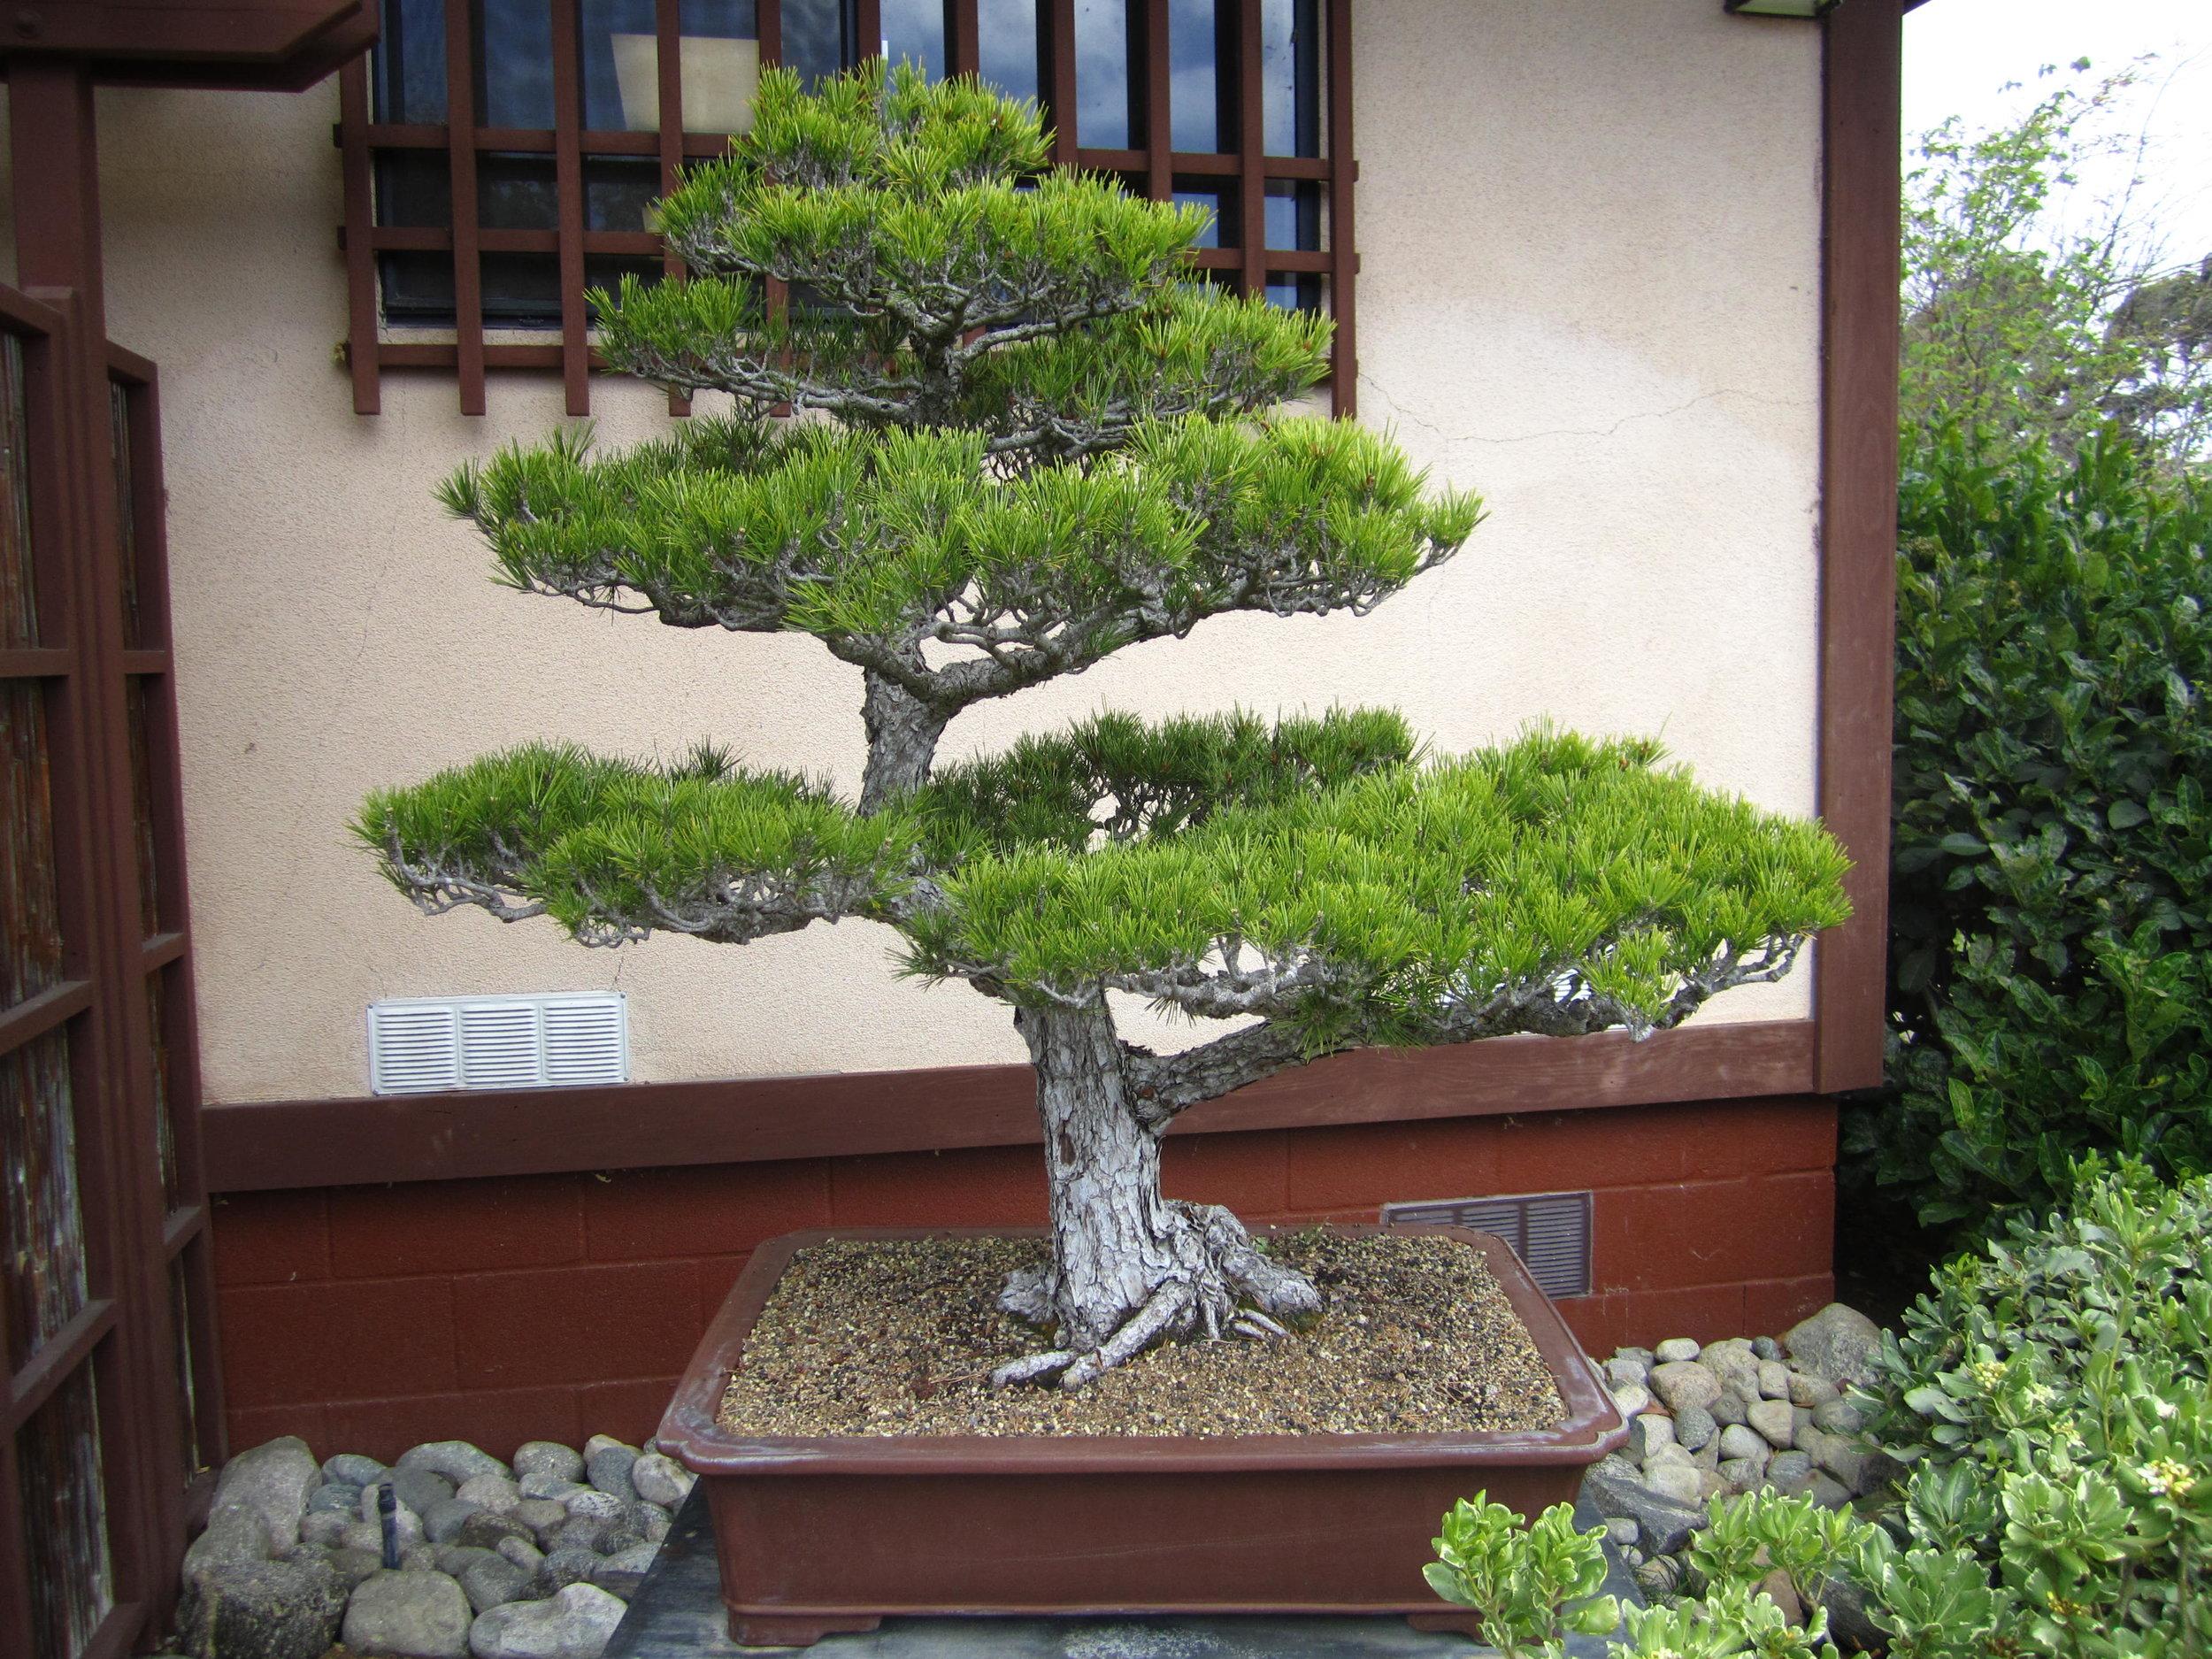 6. Japanese Black Pine